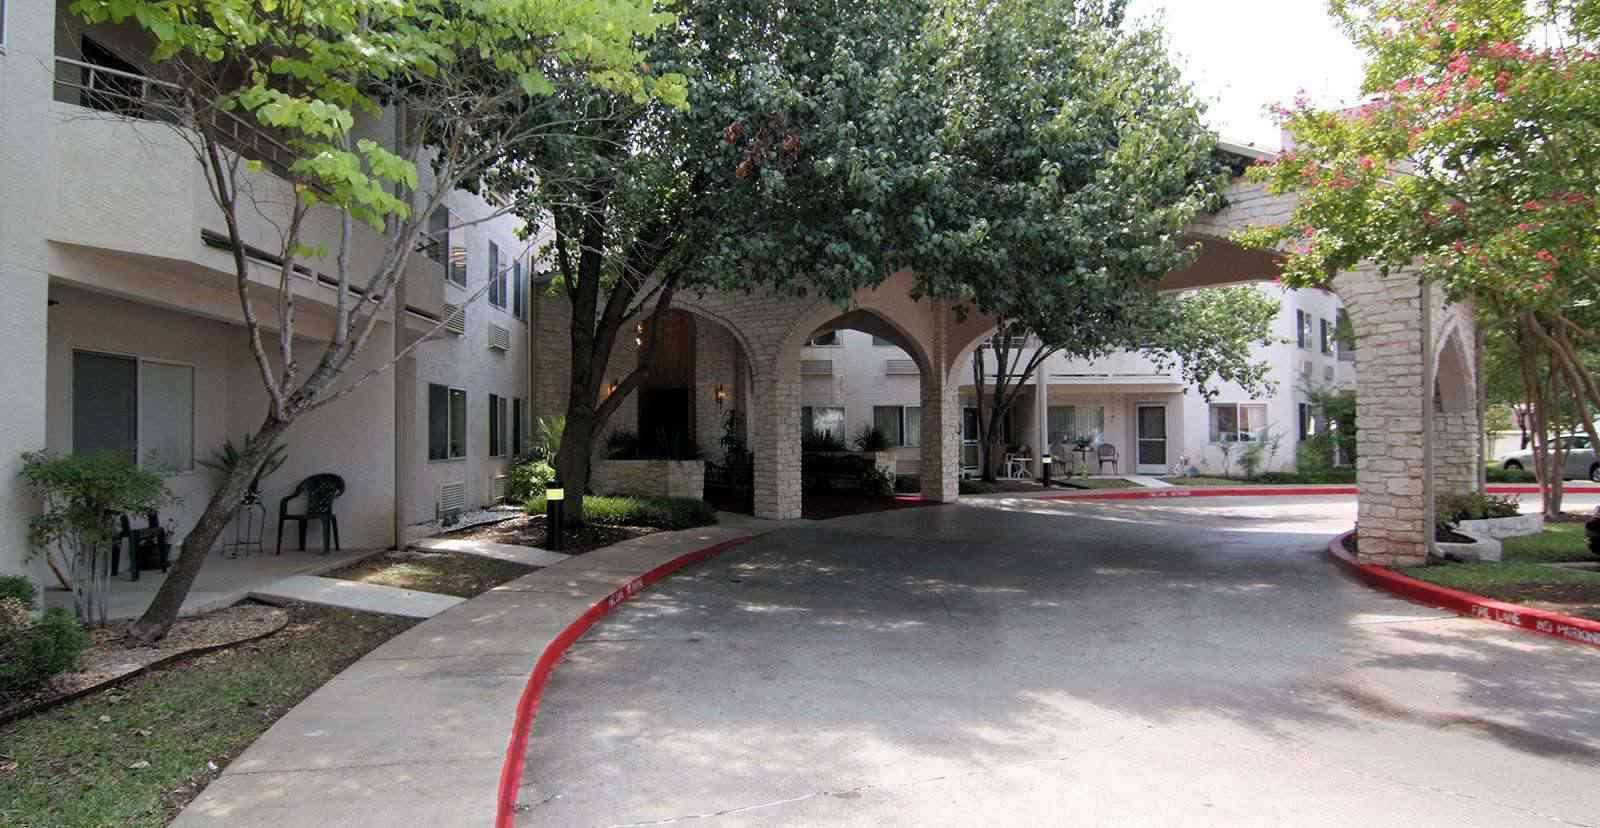 Photo 1 of Solstice Senior Living at Austin